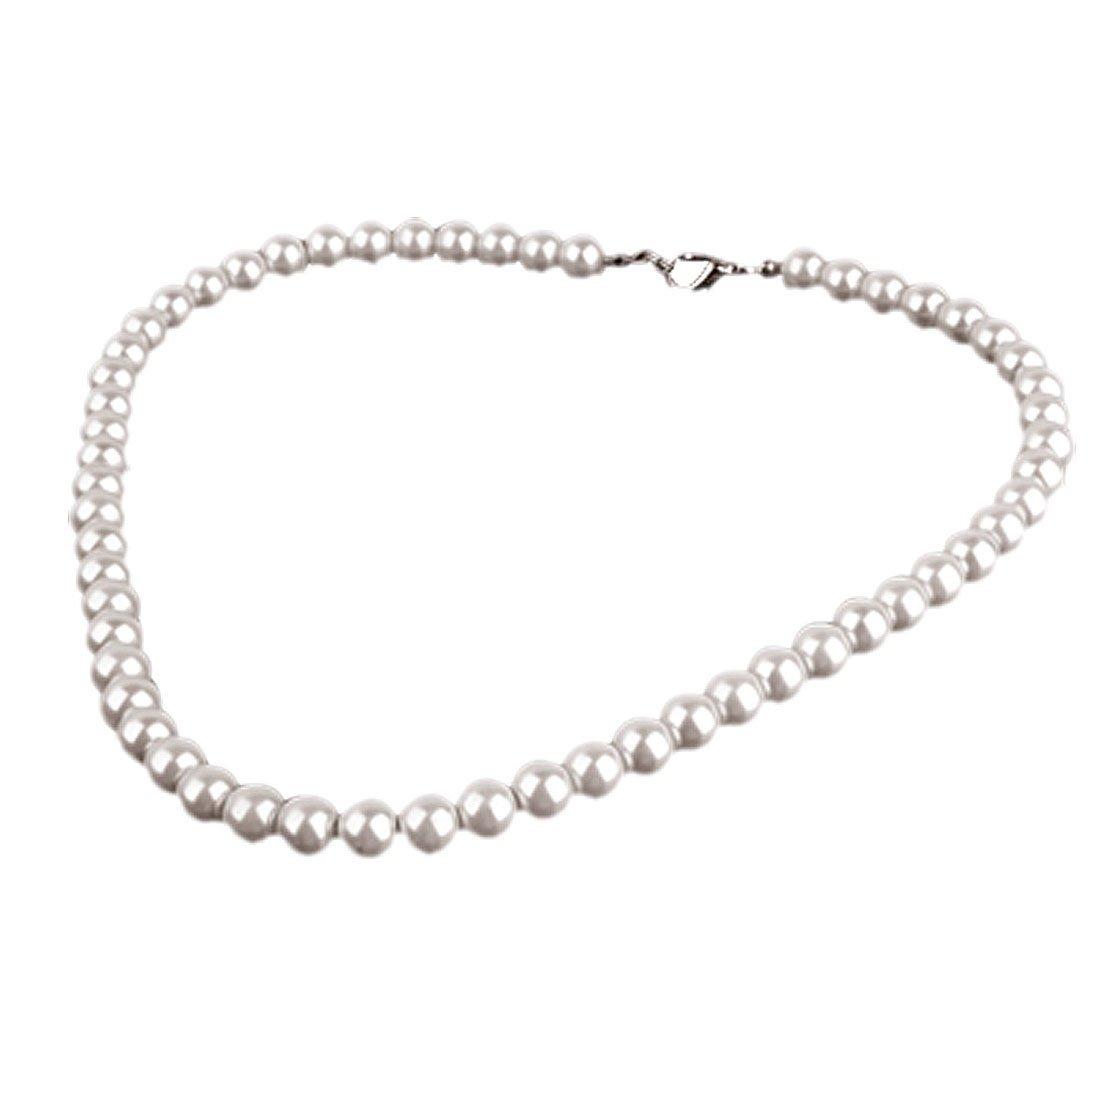 Gleader Collier de perles d'imitation blanc, perimetre de 43cm by Gleader